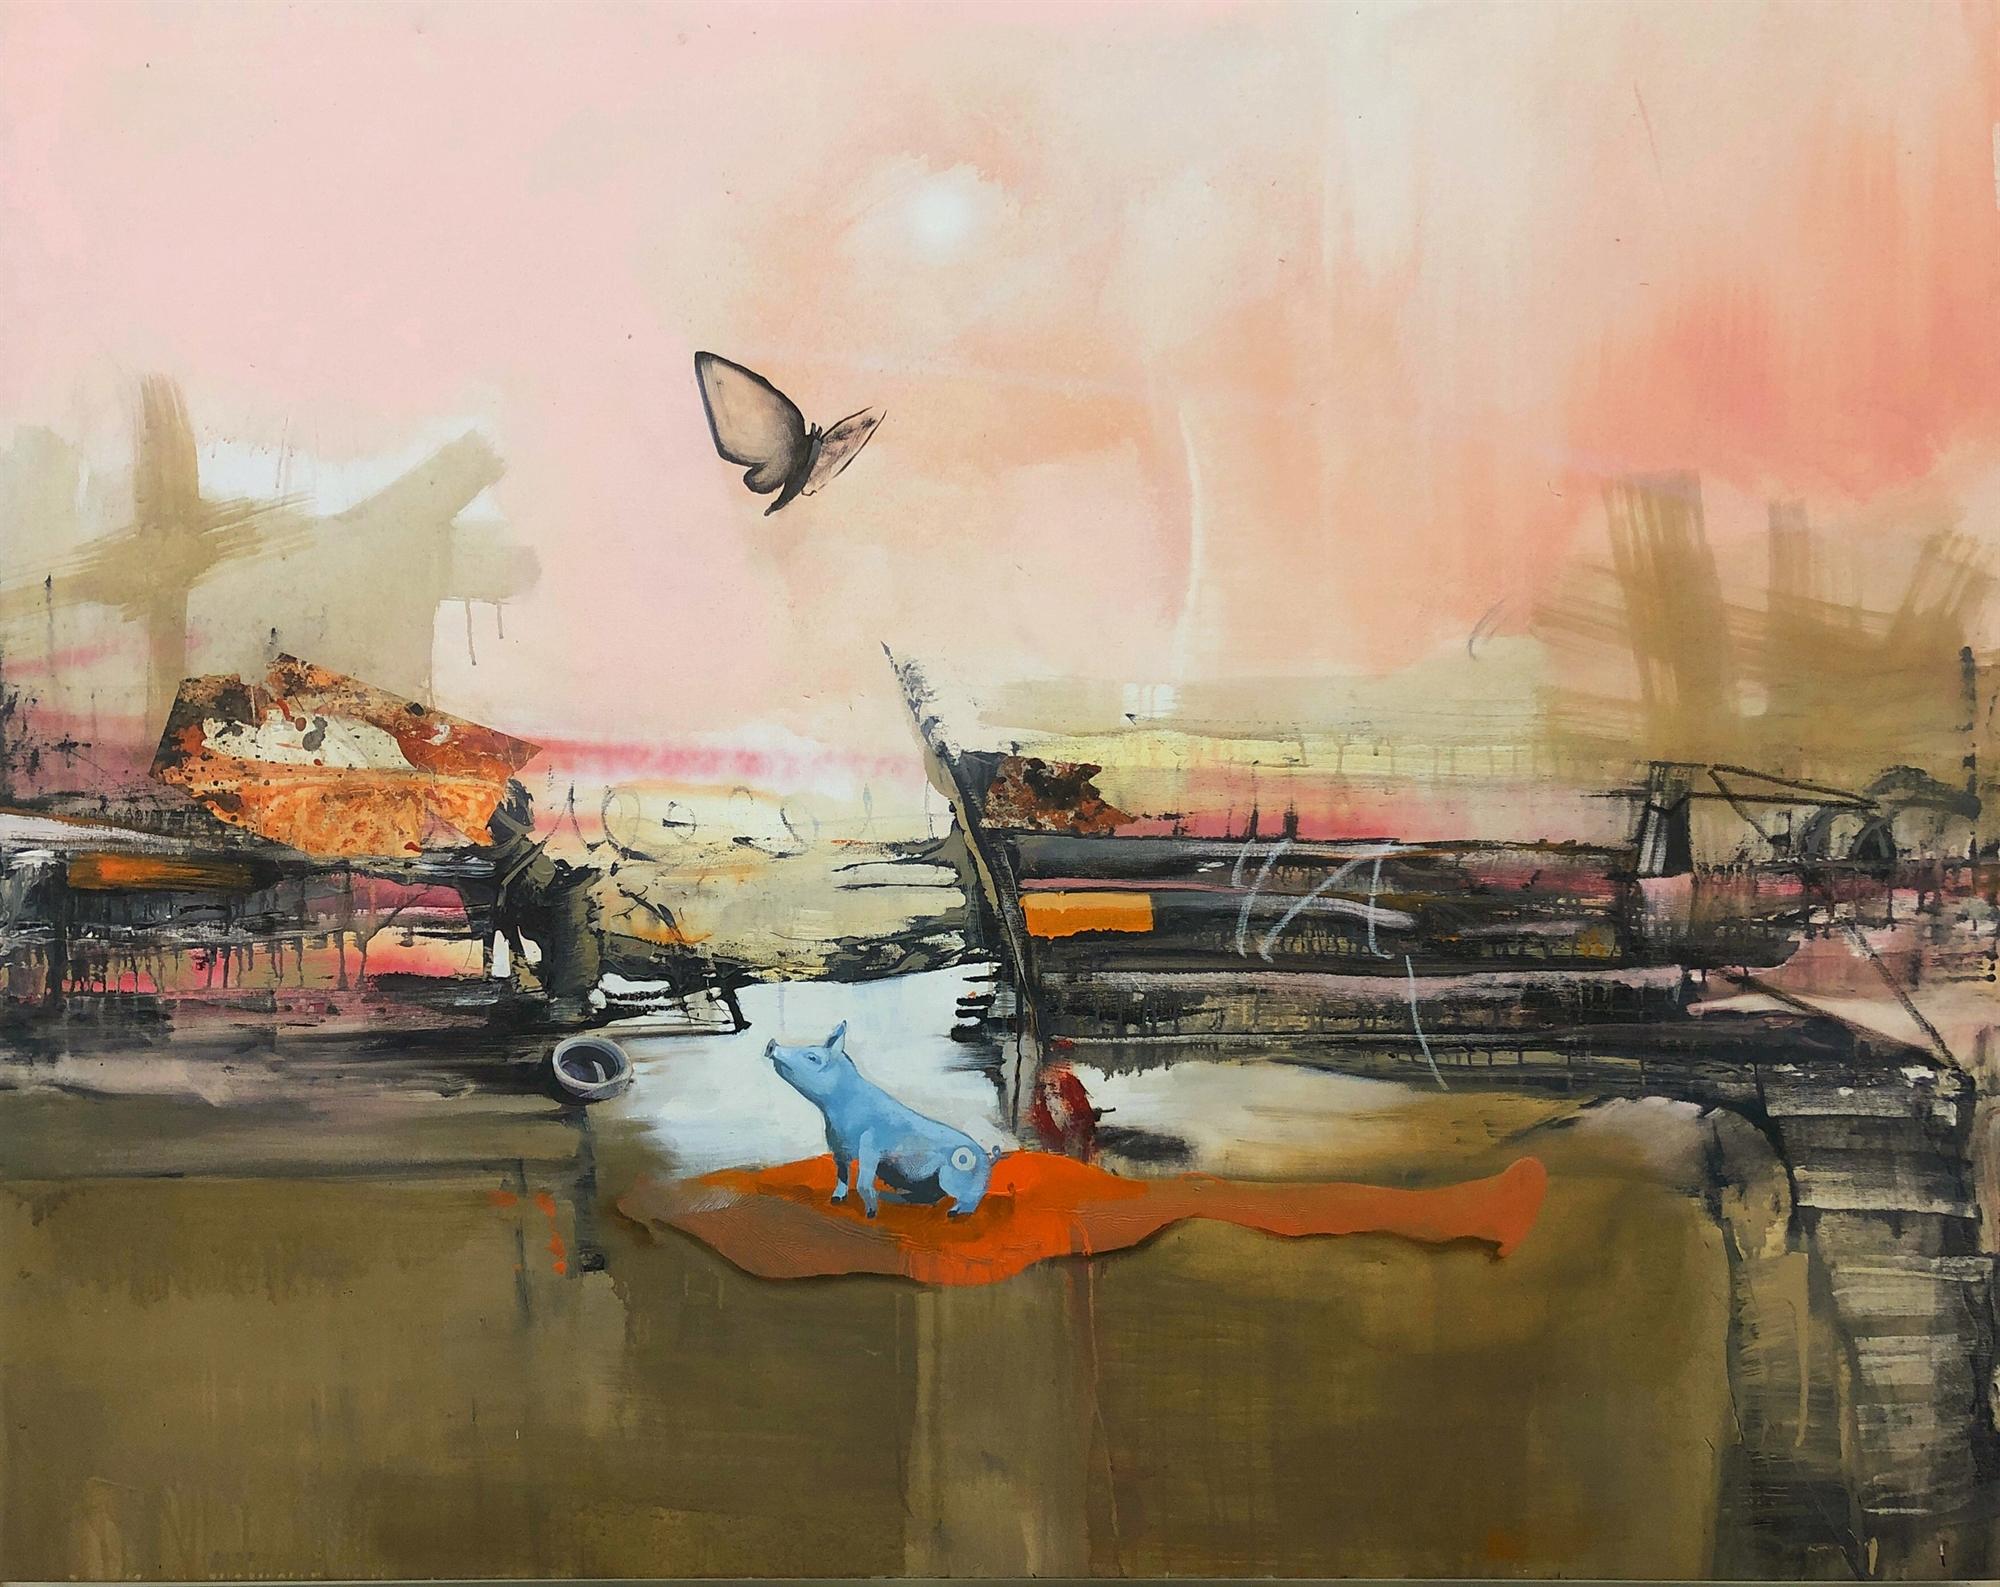 The Hybrid by Marcus Jansen